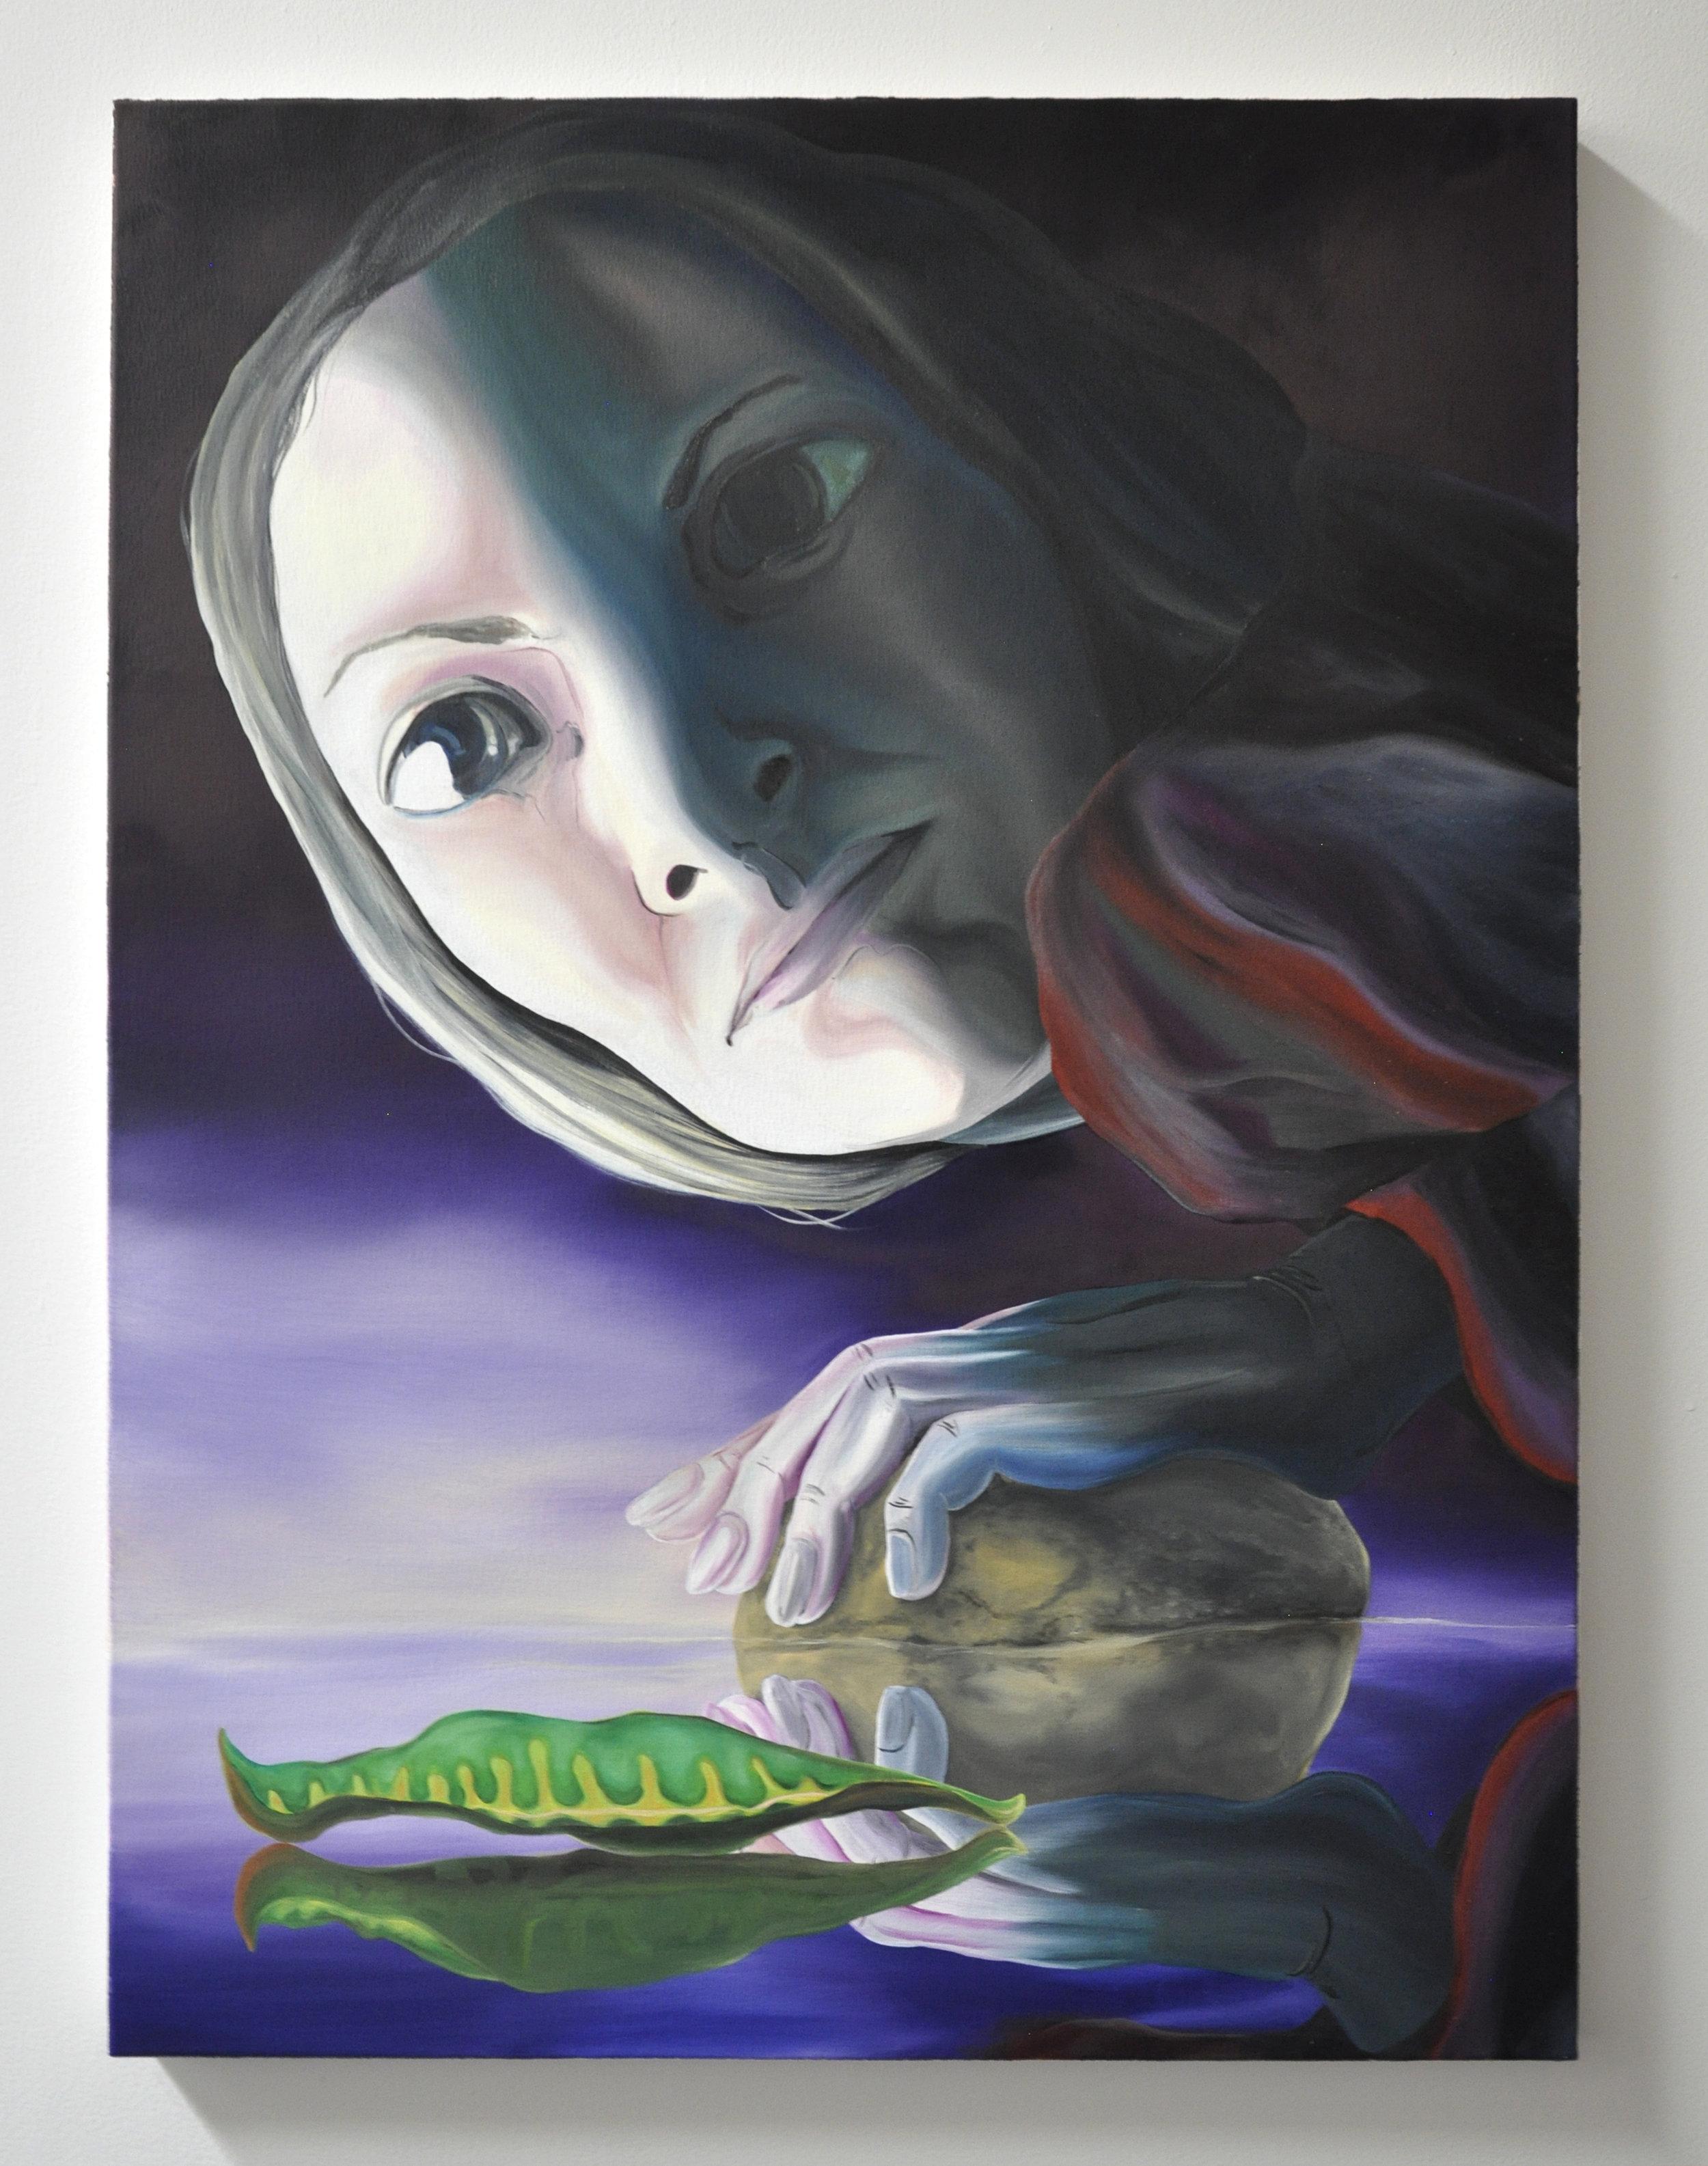 Courtney Johnson, Reptilian Brain #2, oil on canvas, 30 x 40 in, 2019